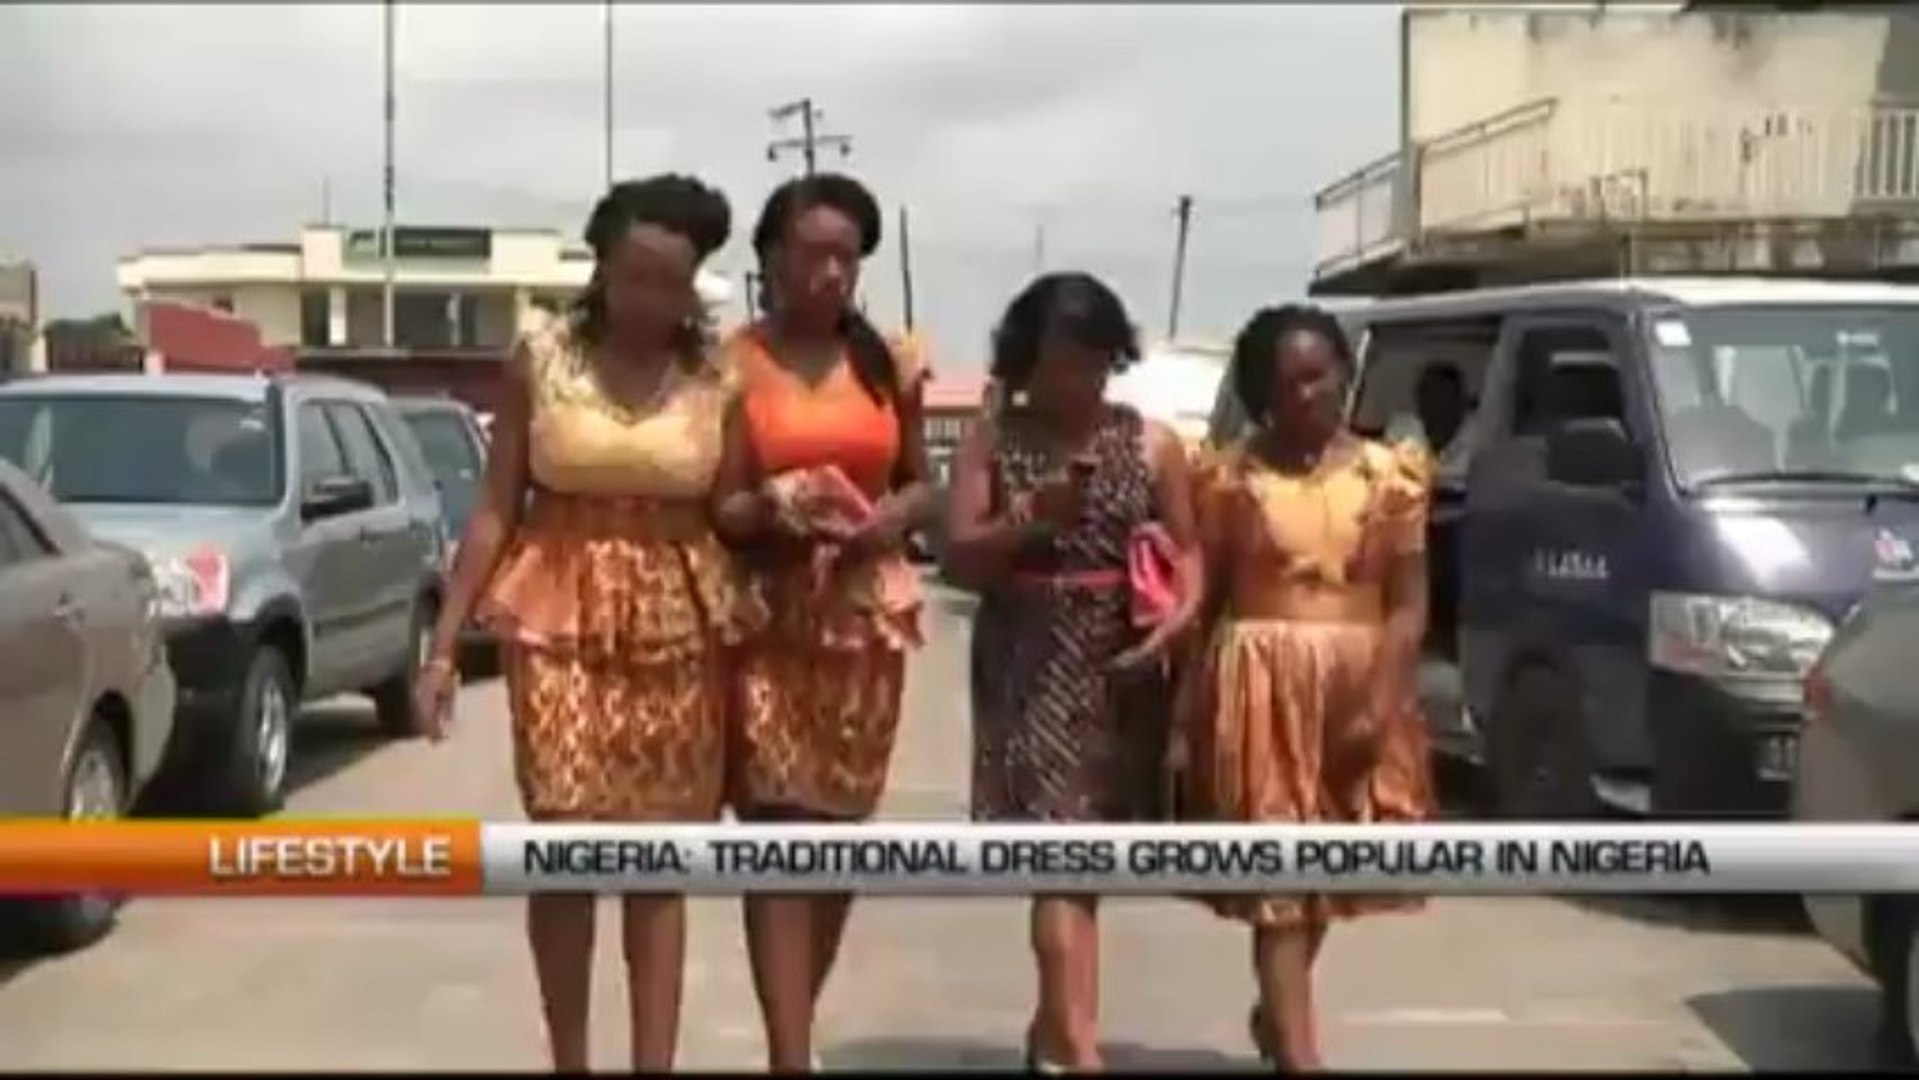 Nigeria: Traditional Family Dress Grows Popular In Nigeria.